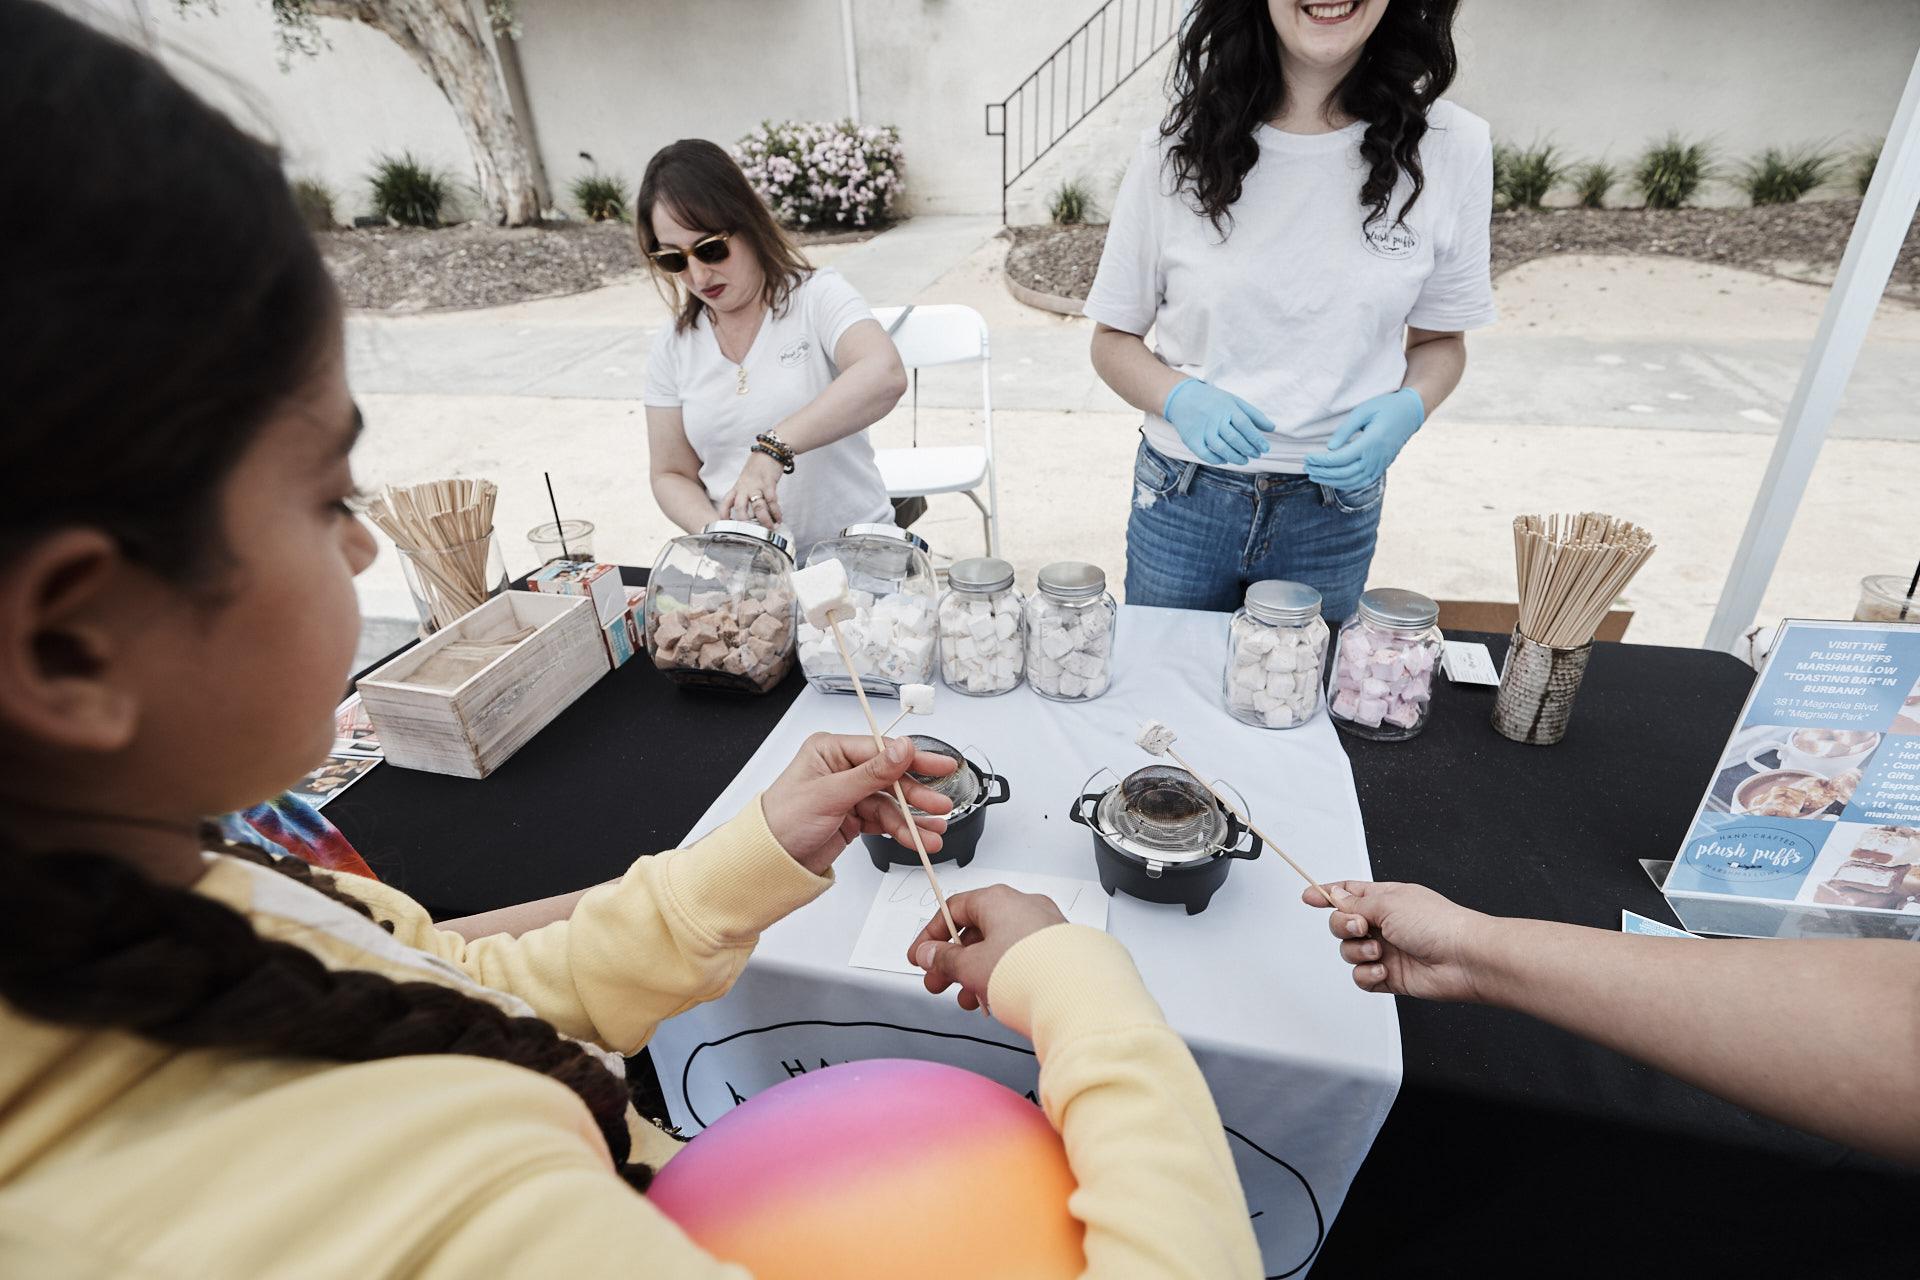 2019-earth-day-taste-of-toluca-celebration-11